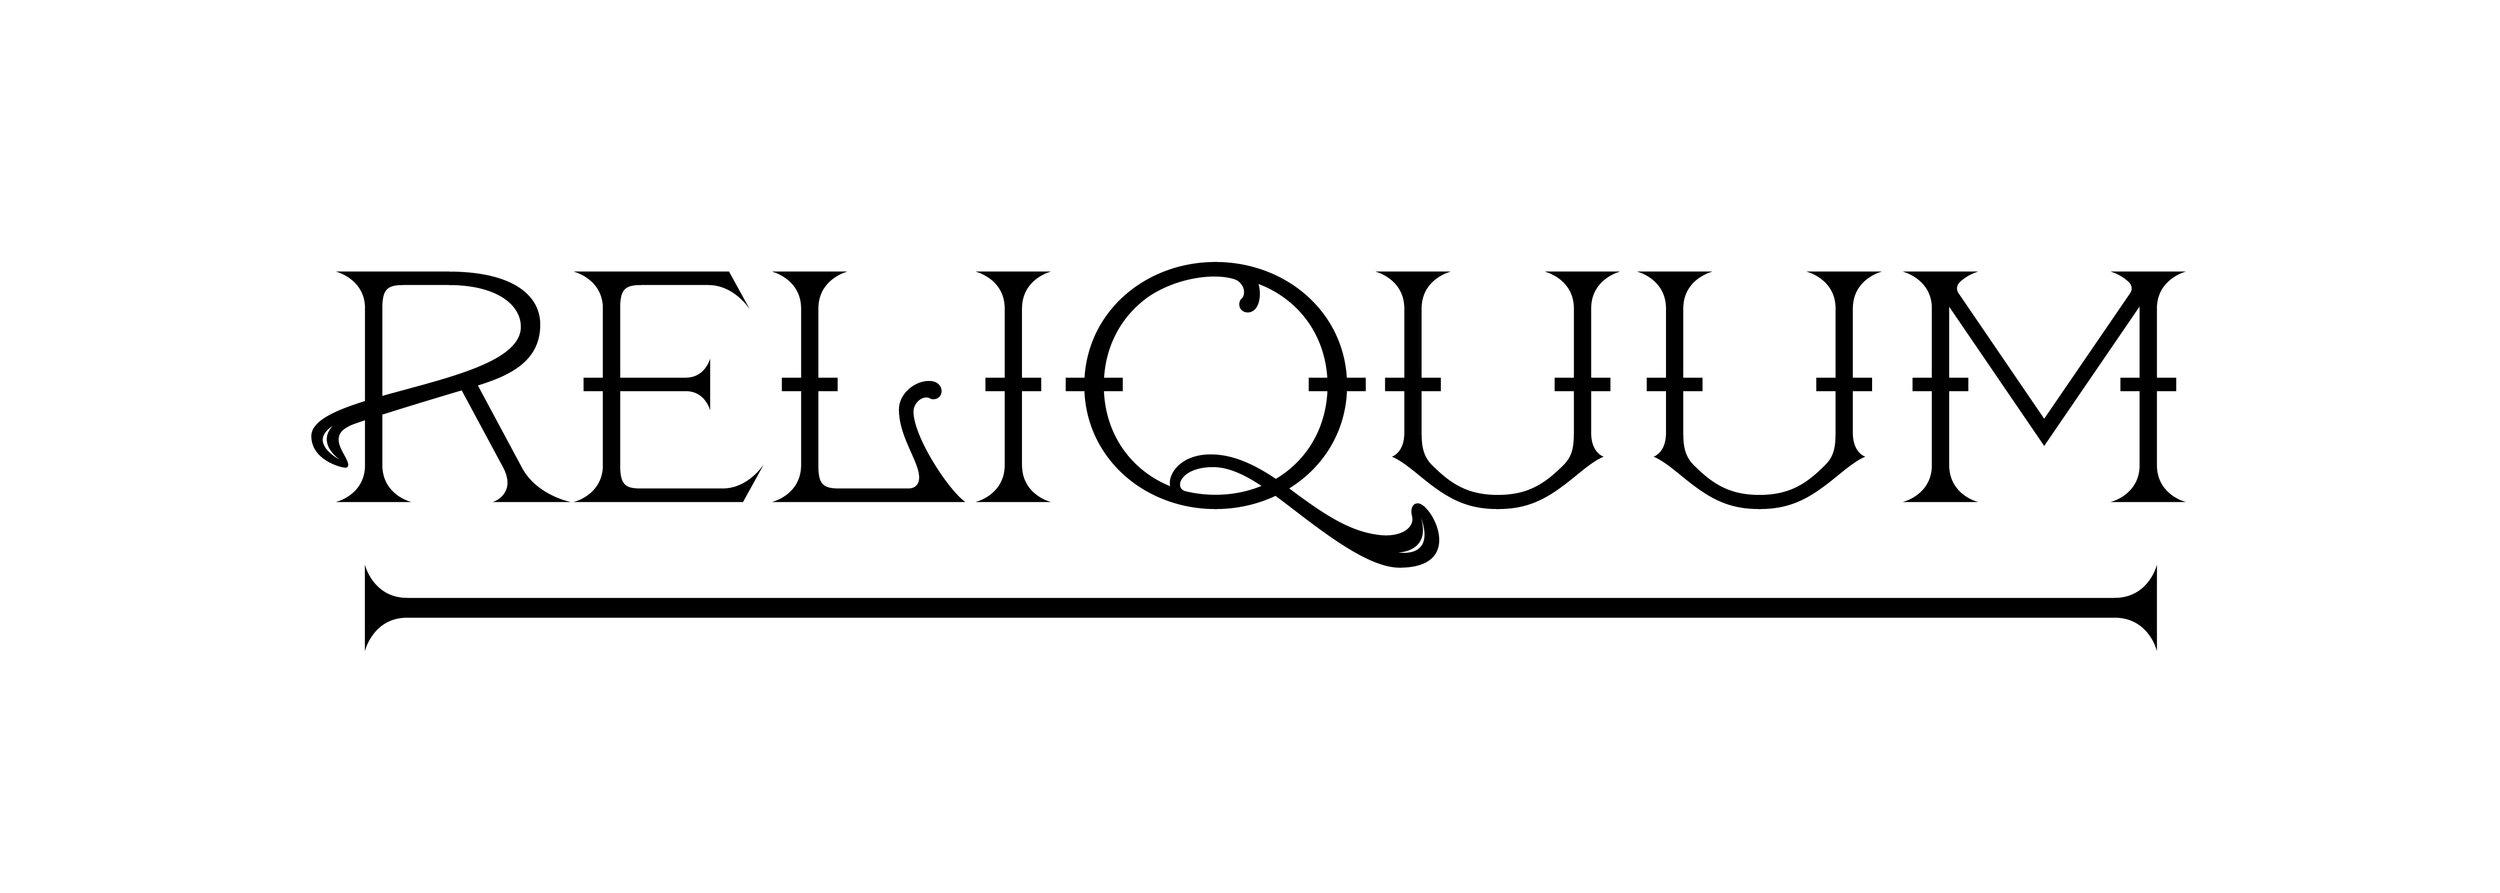 Reliquum logo_LANDSCAPE LOGO BLACK.jpg